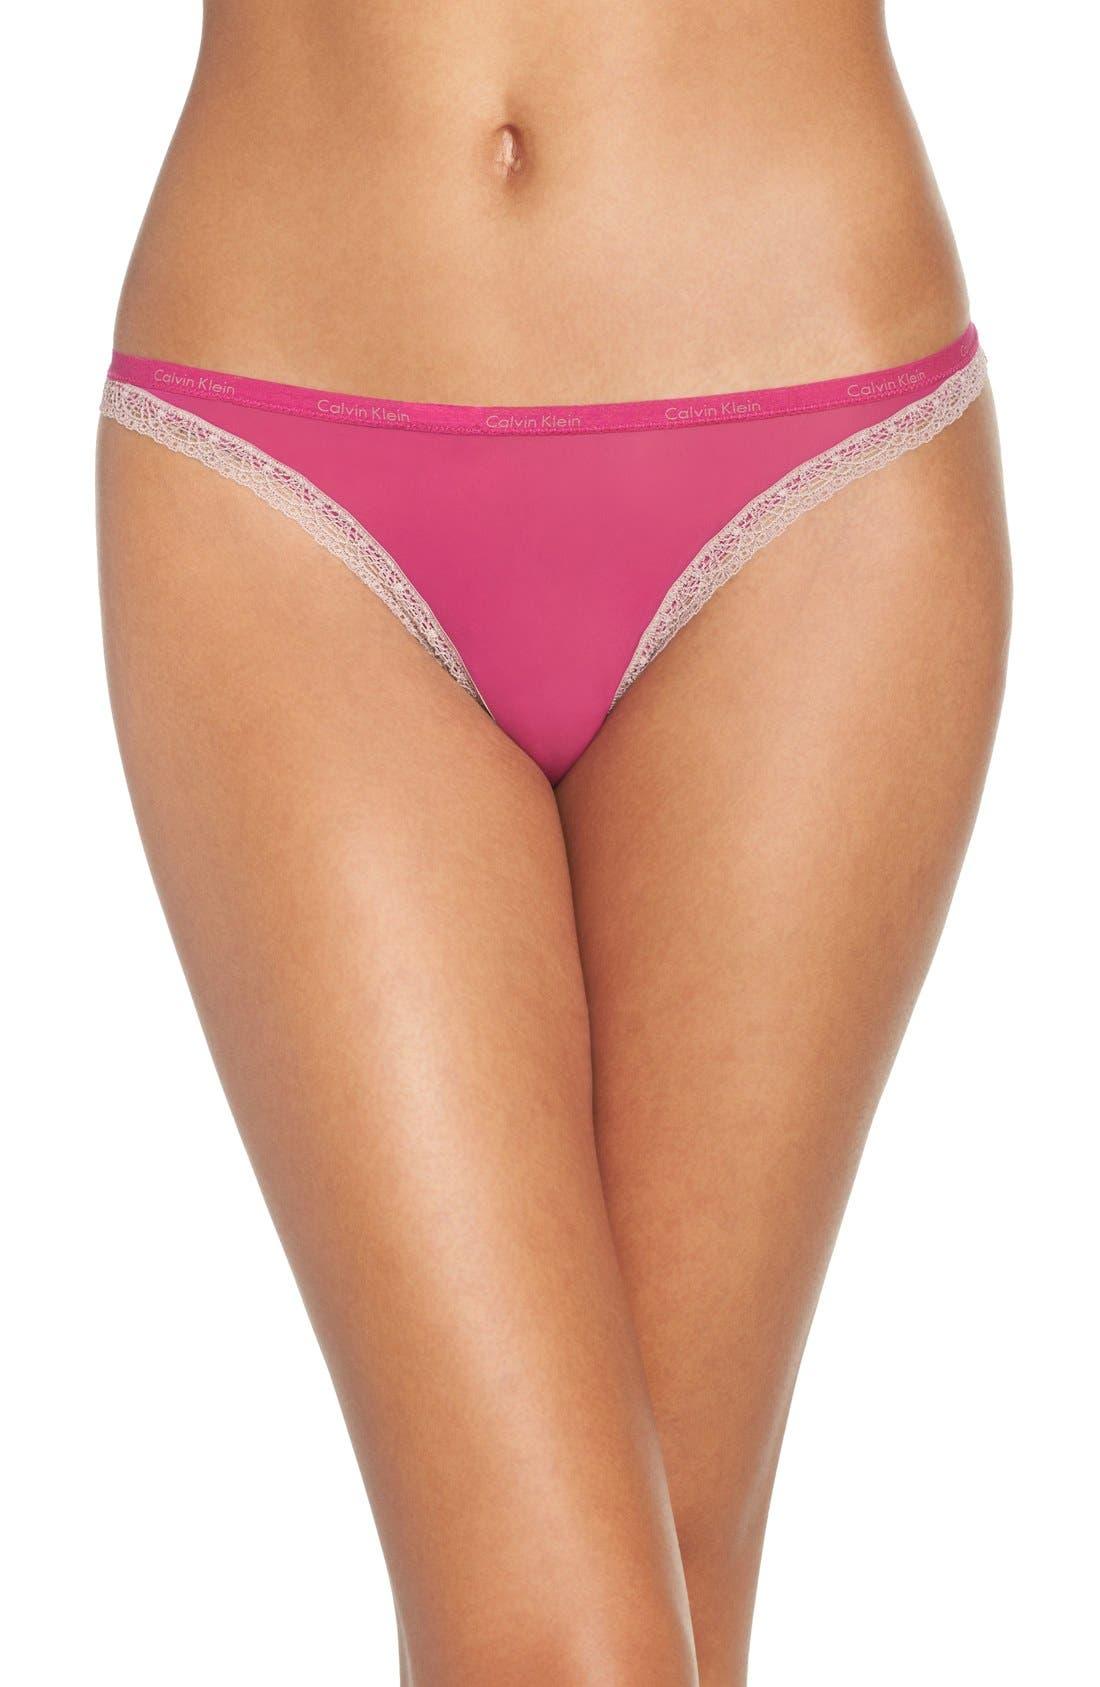 Alternate Image 1 Selected - Calvin Klein 'Bottoms Up' Thong